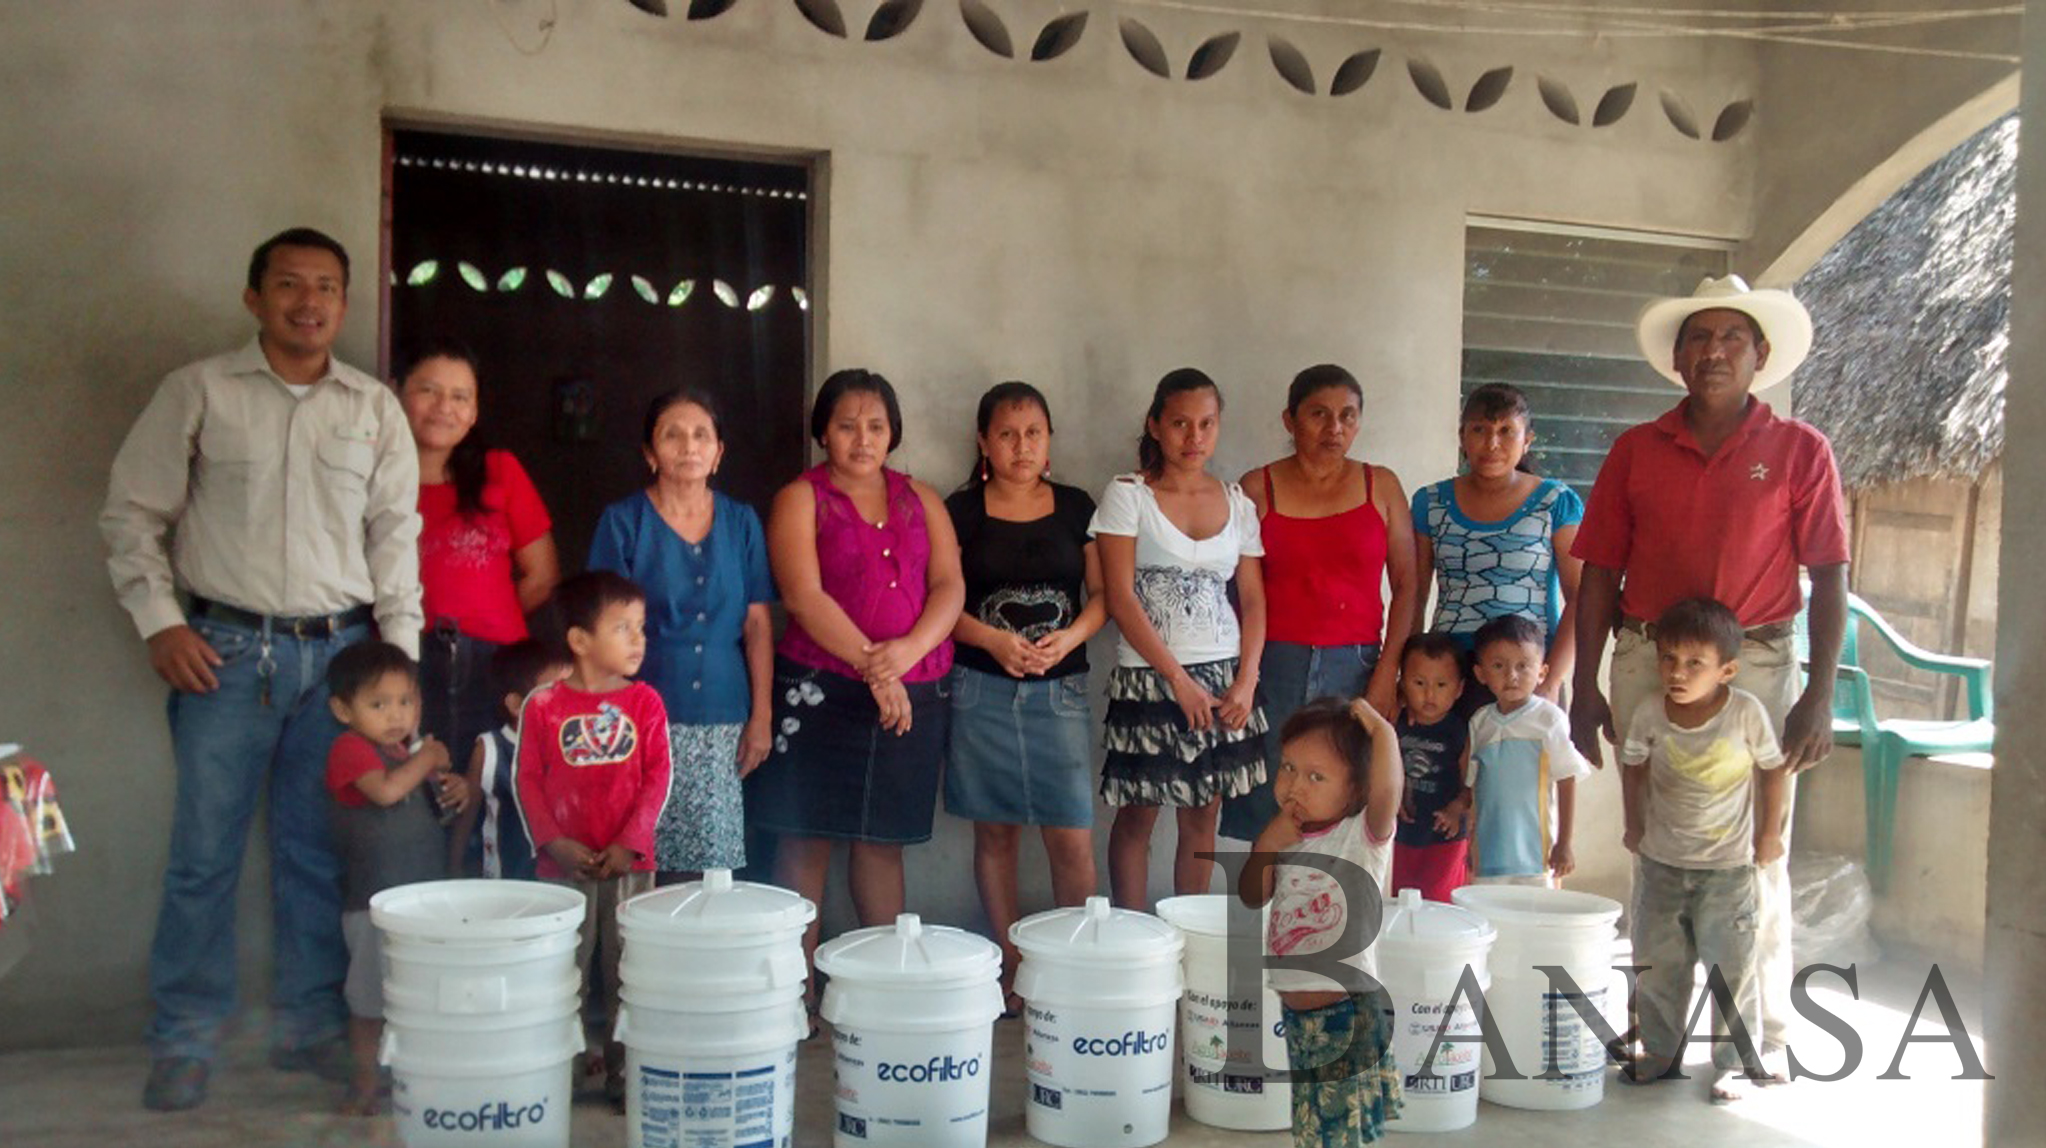 banasa lleva agua potable a comunidades rurales